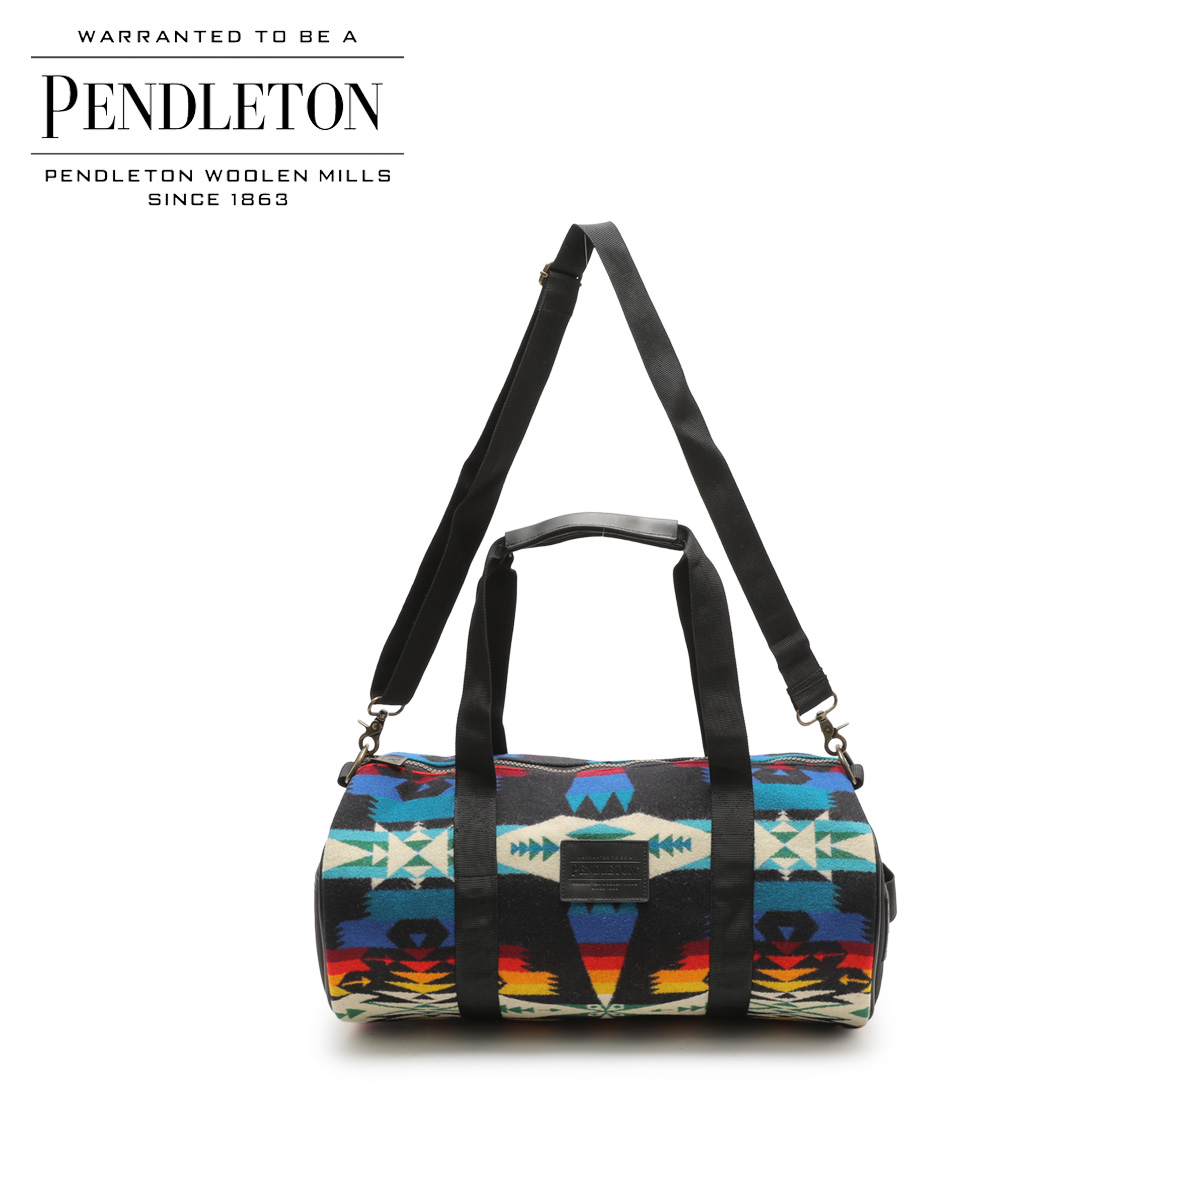 PENDLETON ペンドルトン バッグ ボストンバッグ ROUND GYM BAG メンズ レディース ブラック 黒 GA261